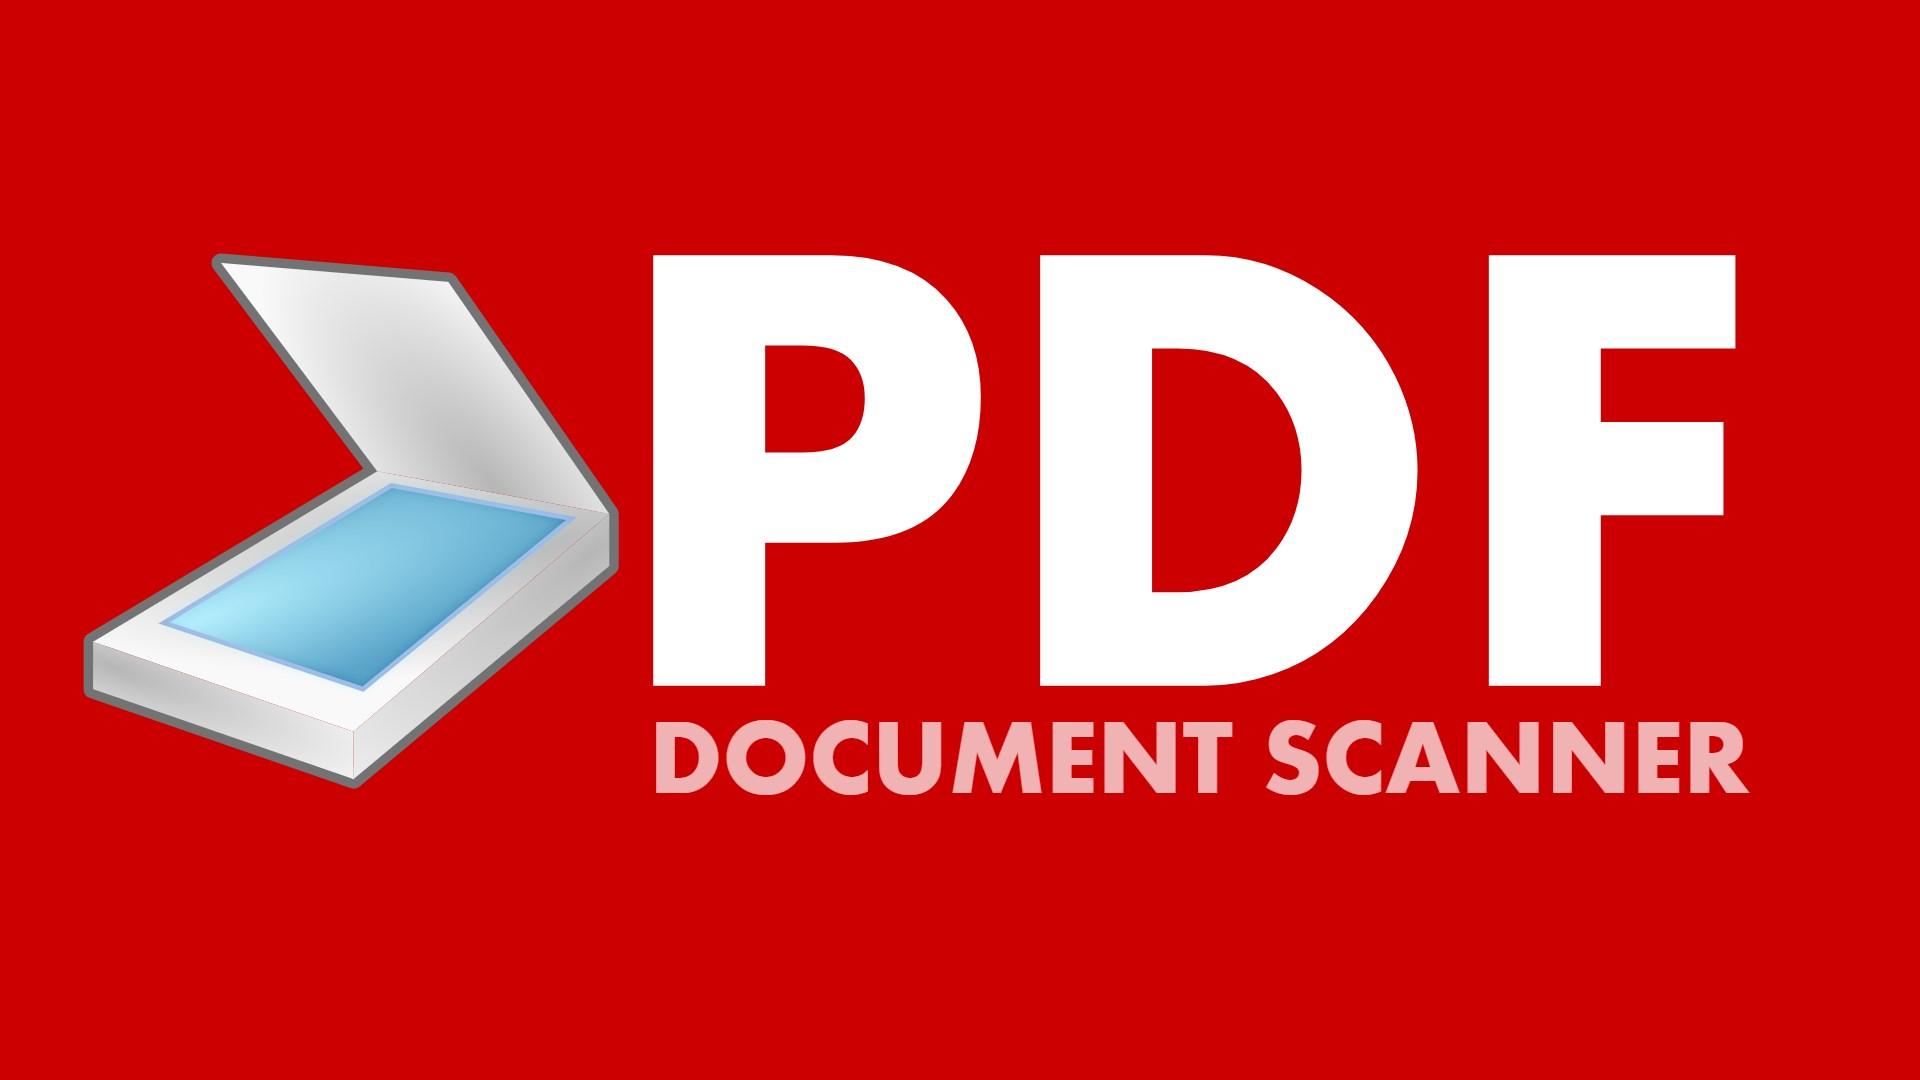 pdf document scanner [ 1920 x 1080 Pixel ]